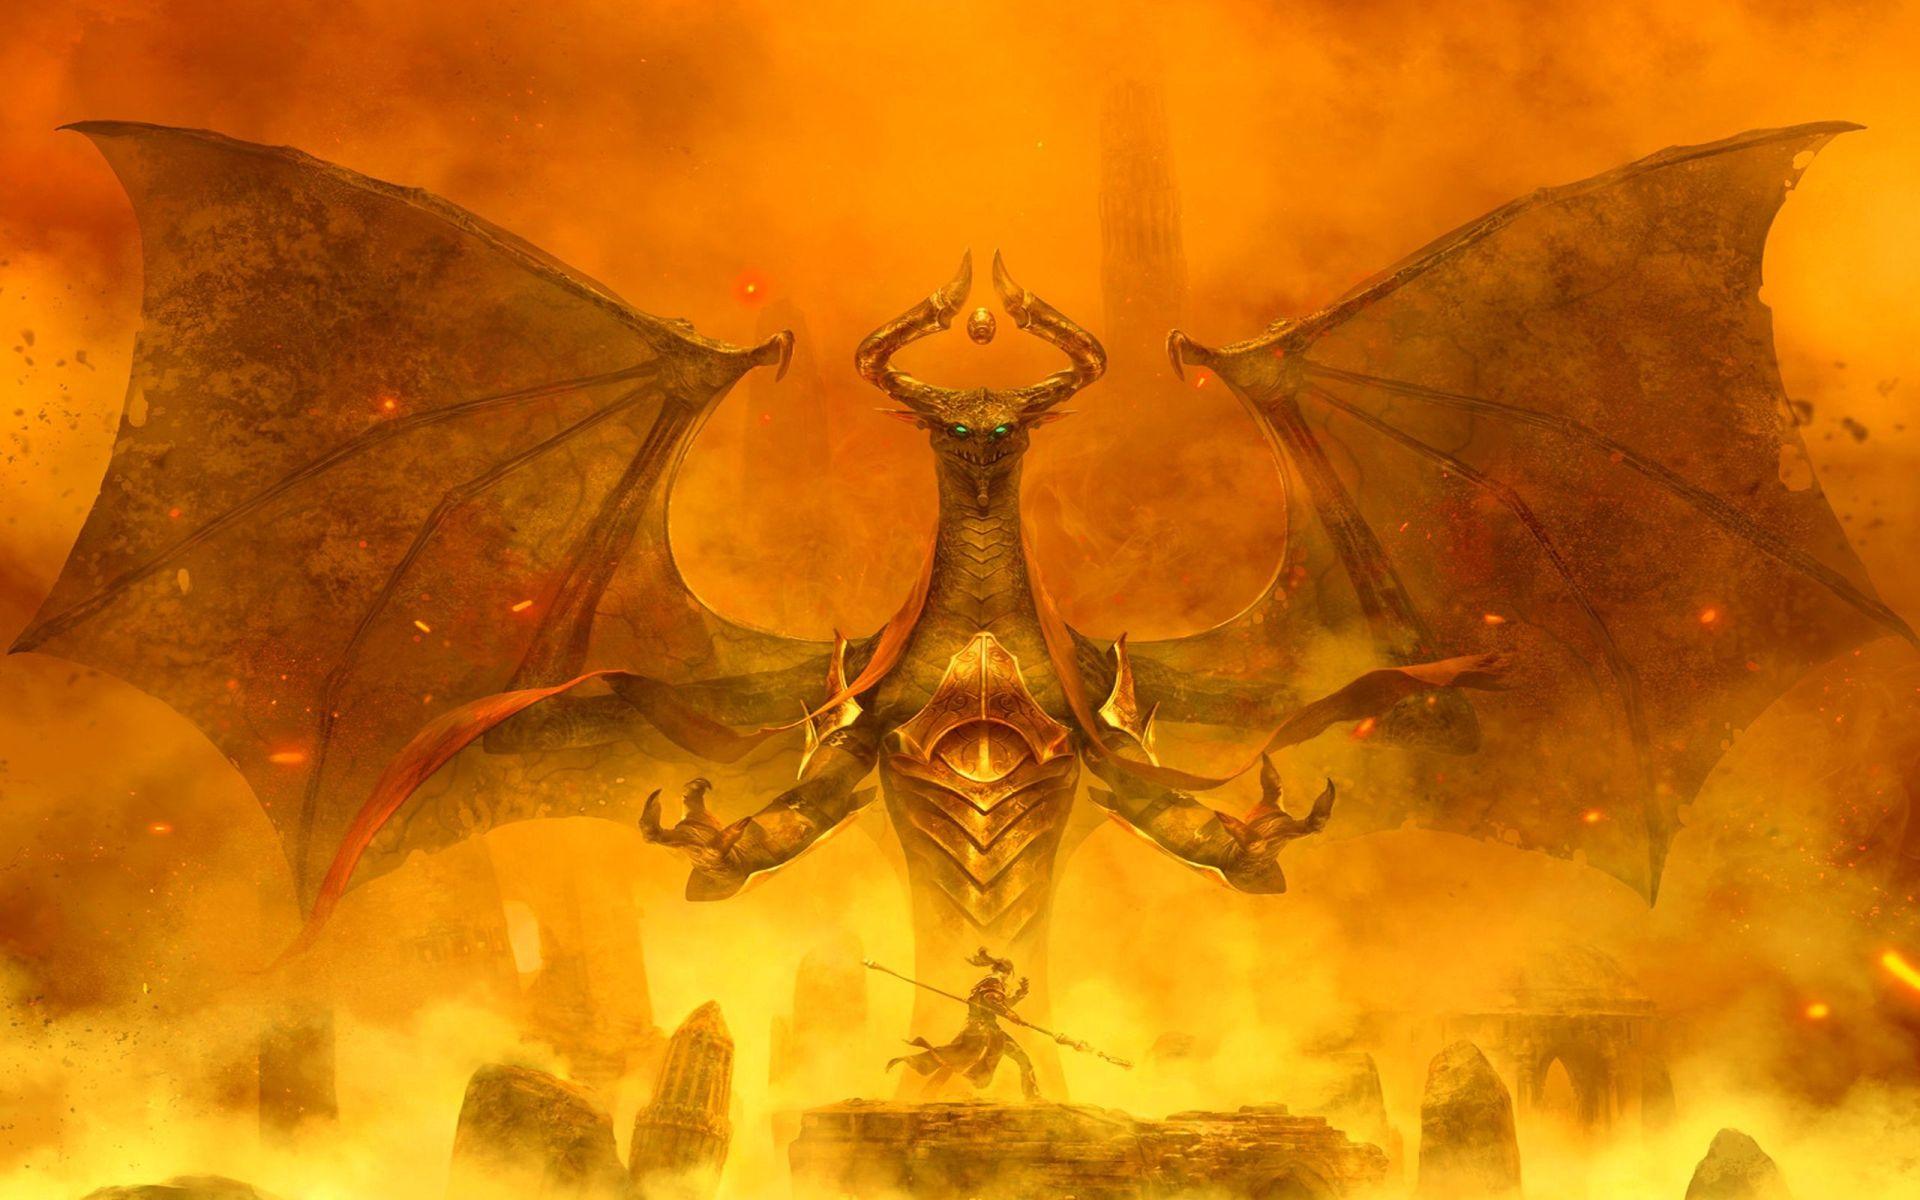 dragon hd image free downloa